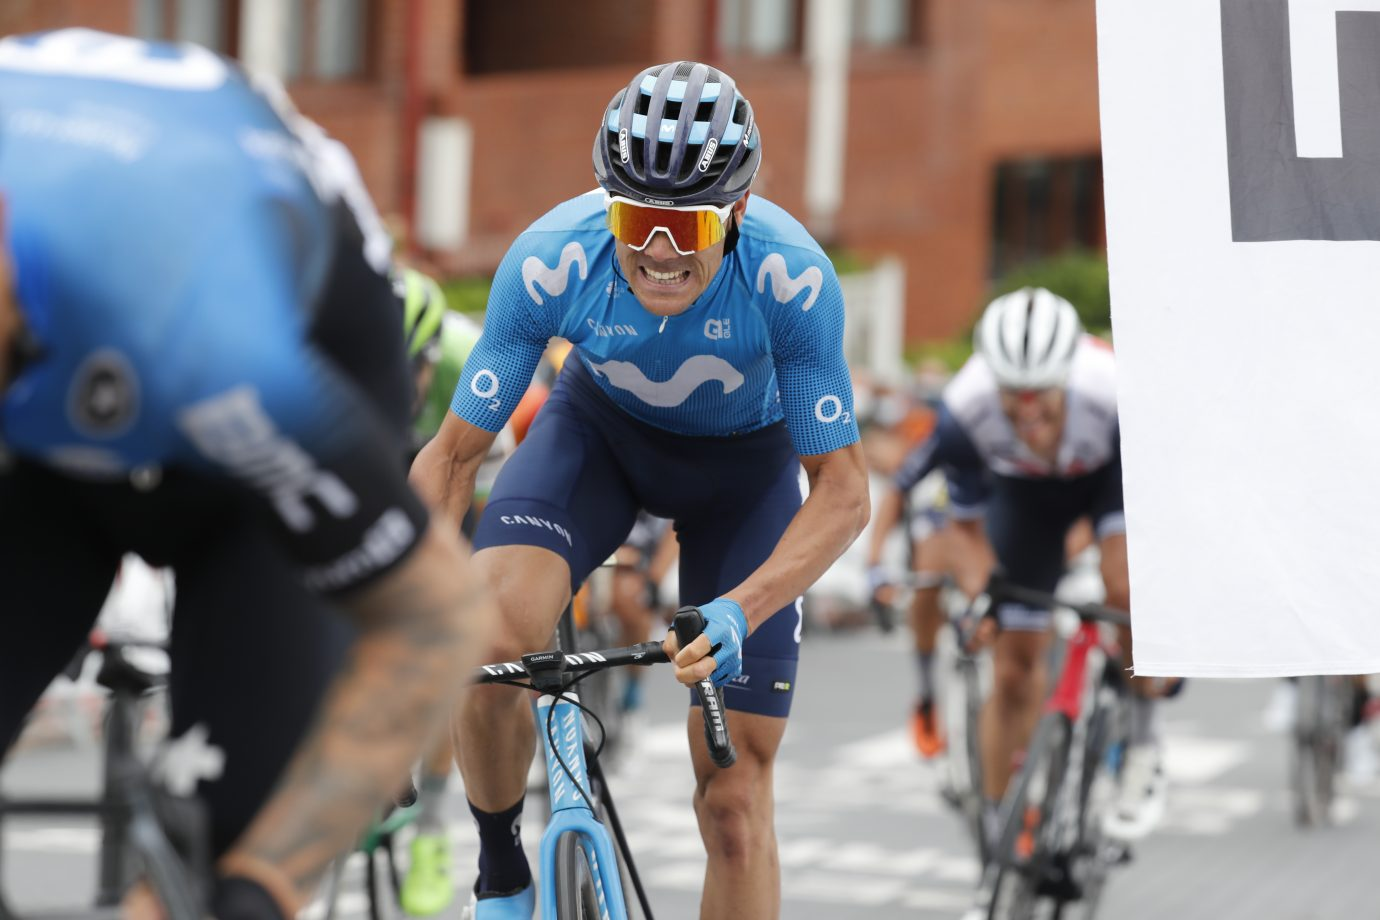 Imagen de la noticia 'Prades (3rd) scores first podium for Blues in '2020 2.0' season'